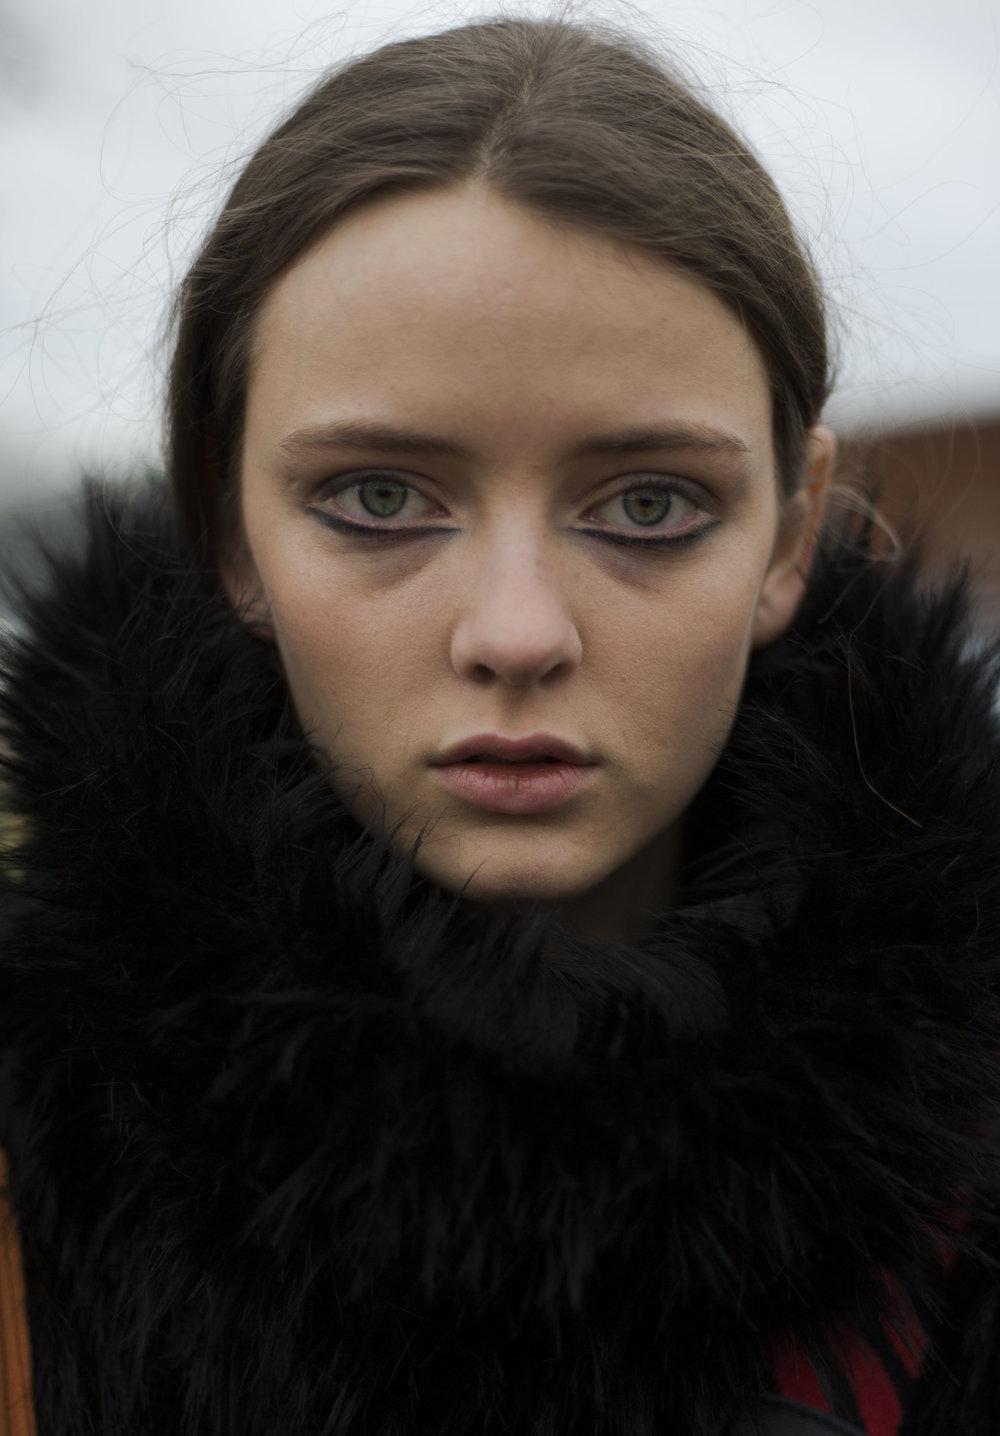 clara-mcnair-unique-models-copenhagen-fashion-week-aw18-scandinavian-street-style-streetstyle-thestreetland-fashion-best-style.jpg